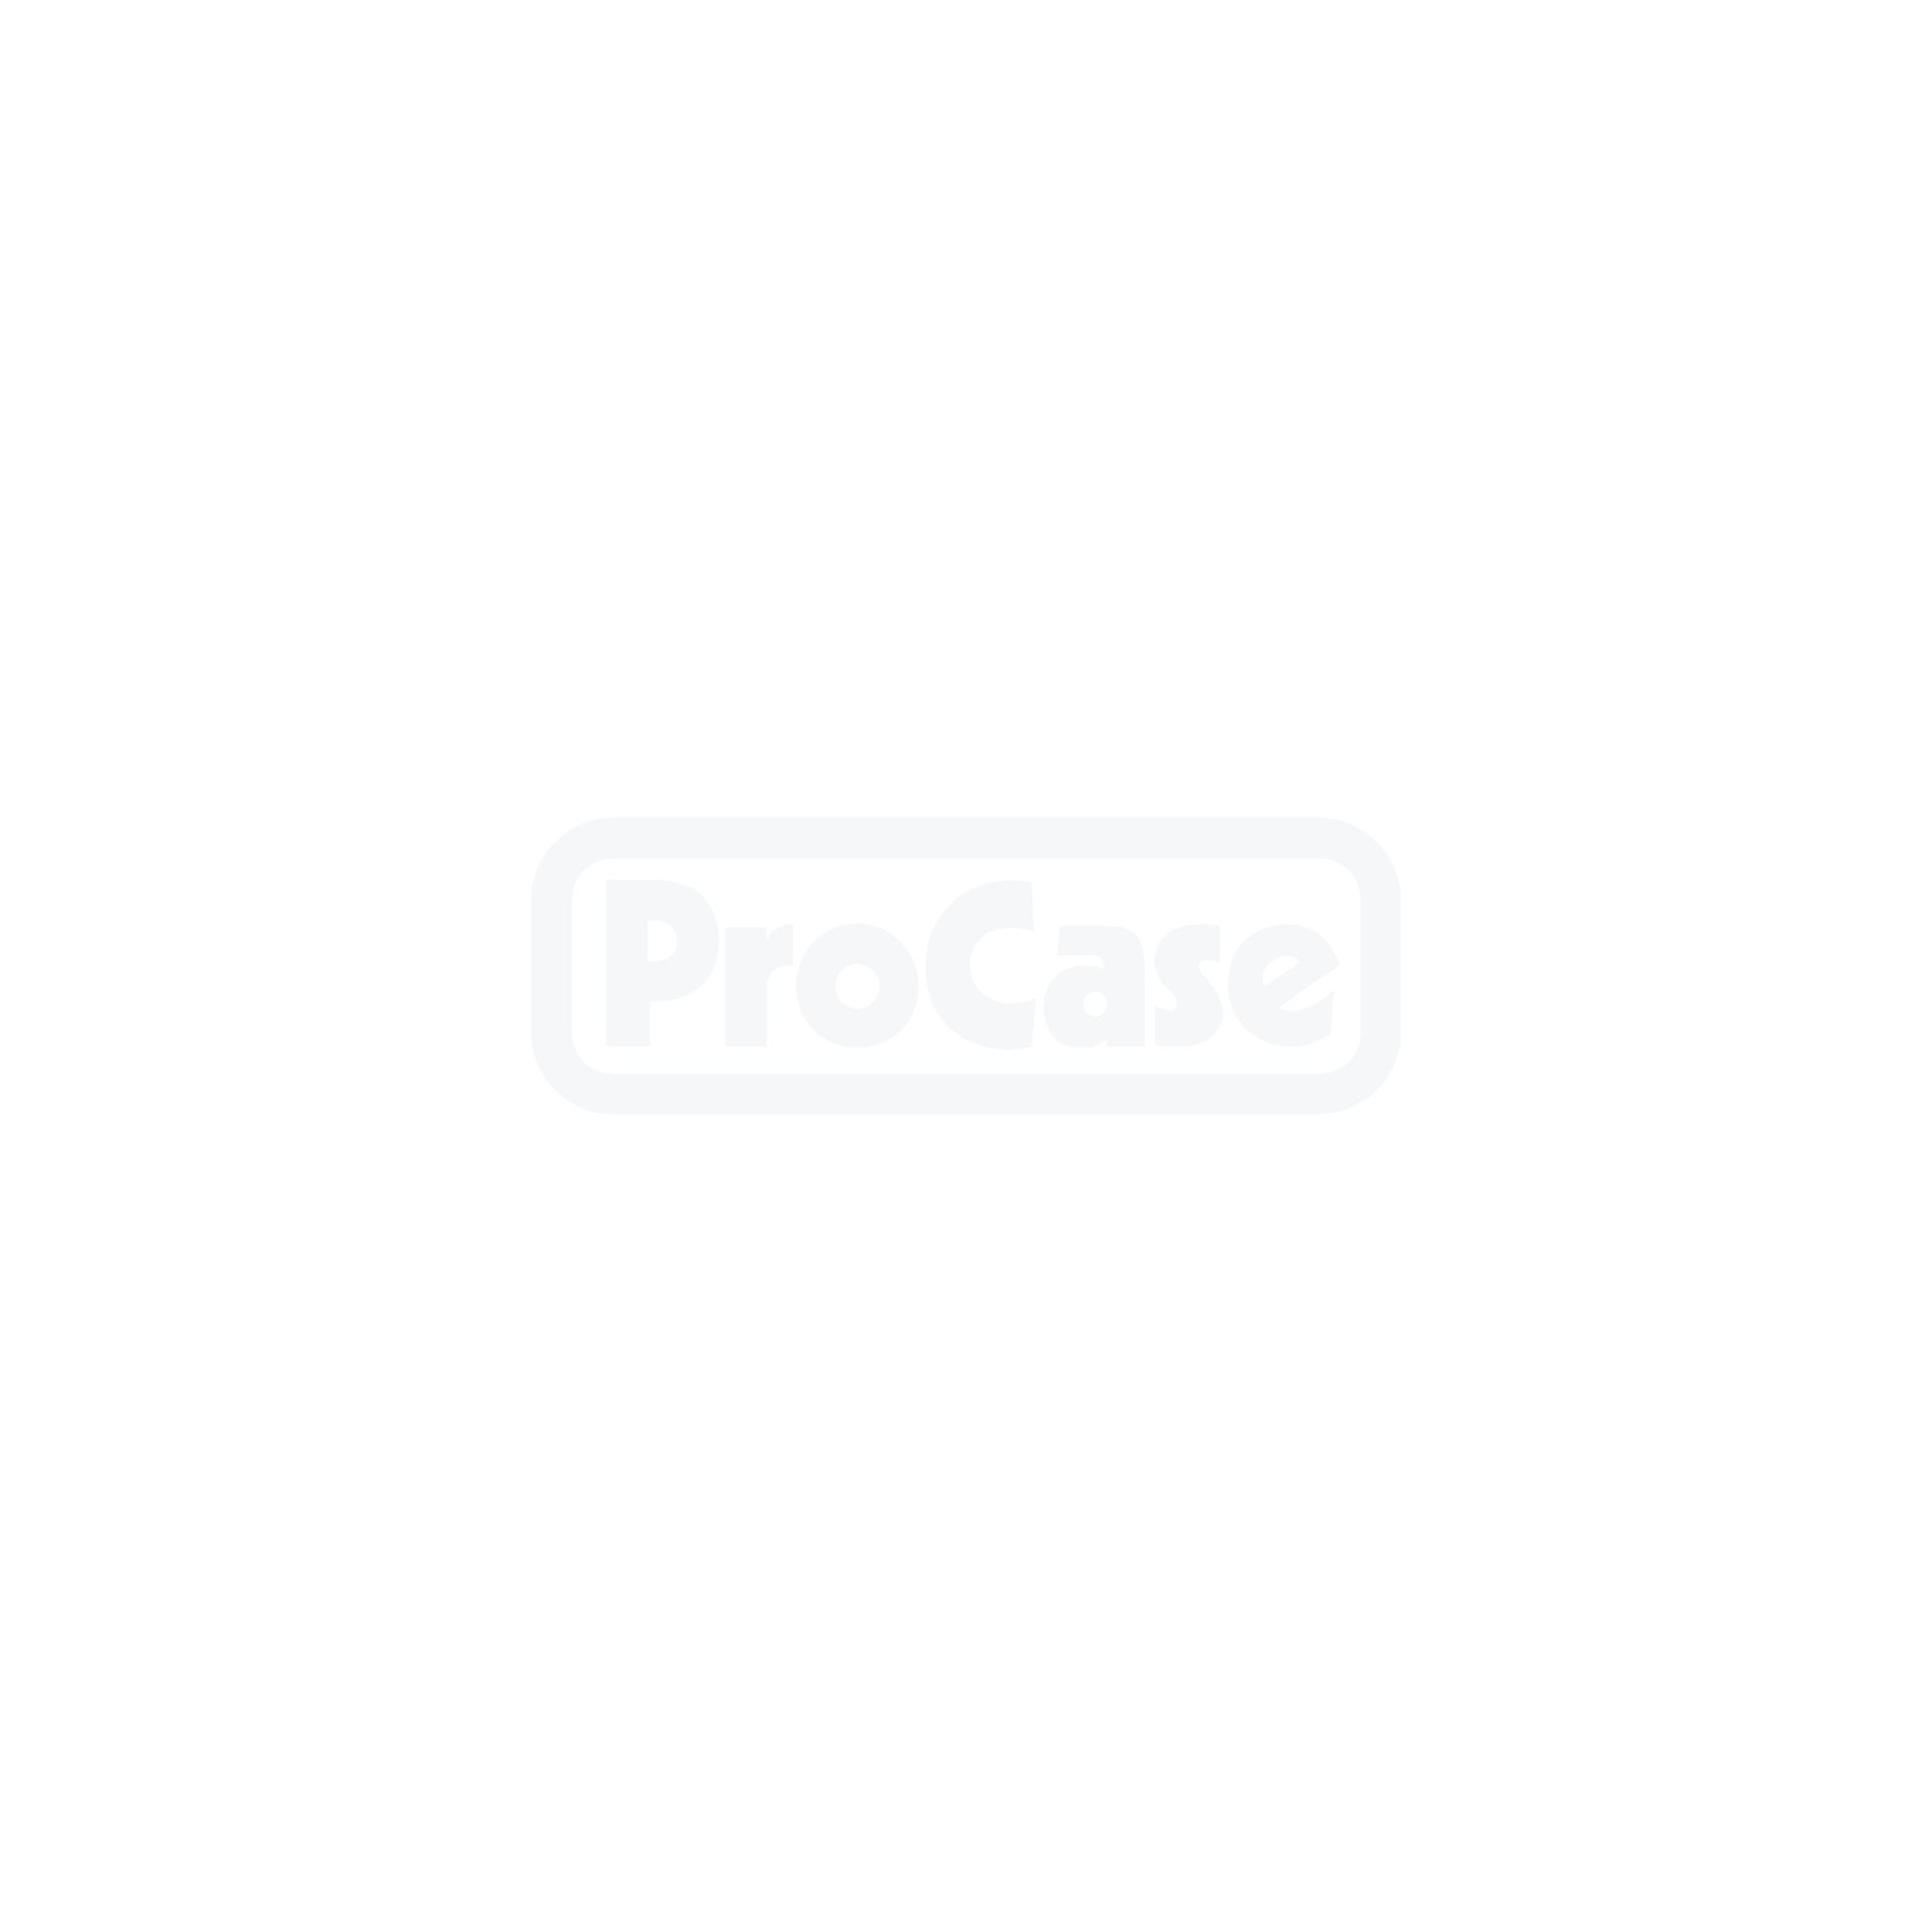 Flightcase für Sick Analysesystem MCS100E